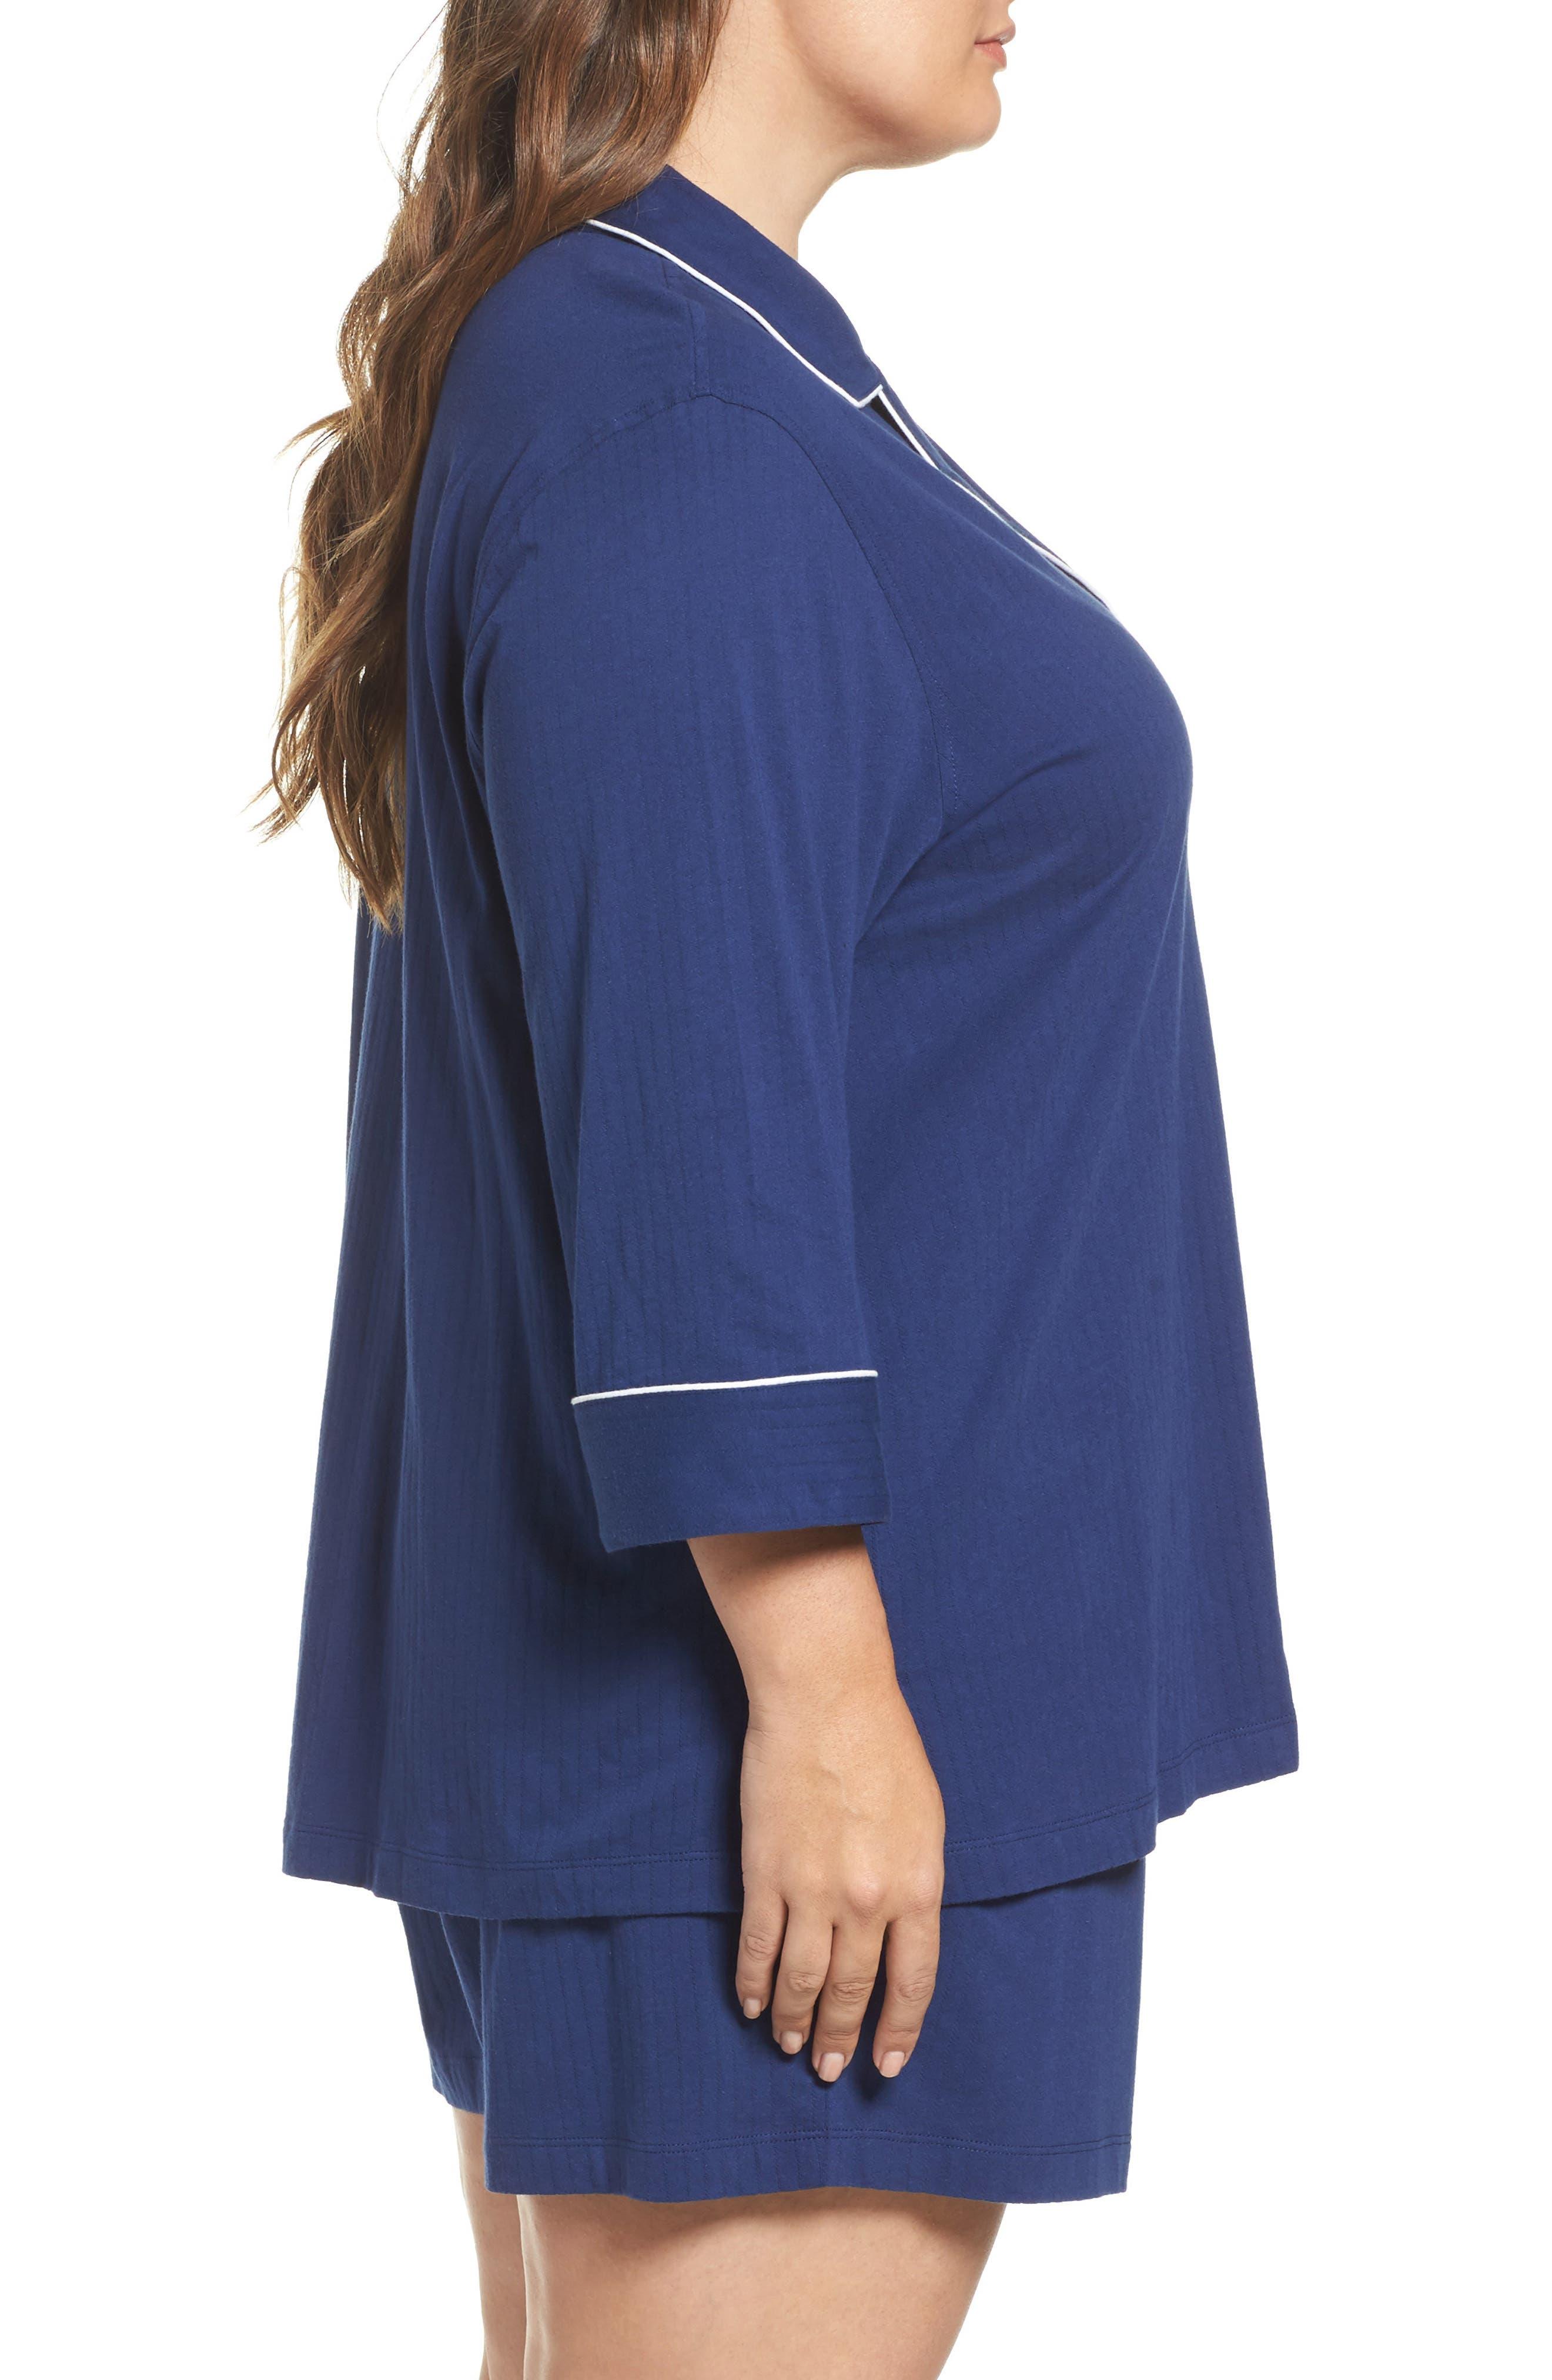 Notched Collar Pajamas,                             Alternate thumbnail 3, color,                             Navy